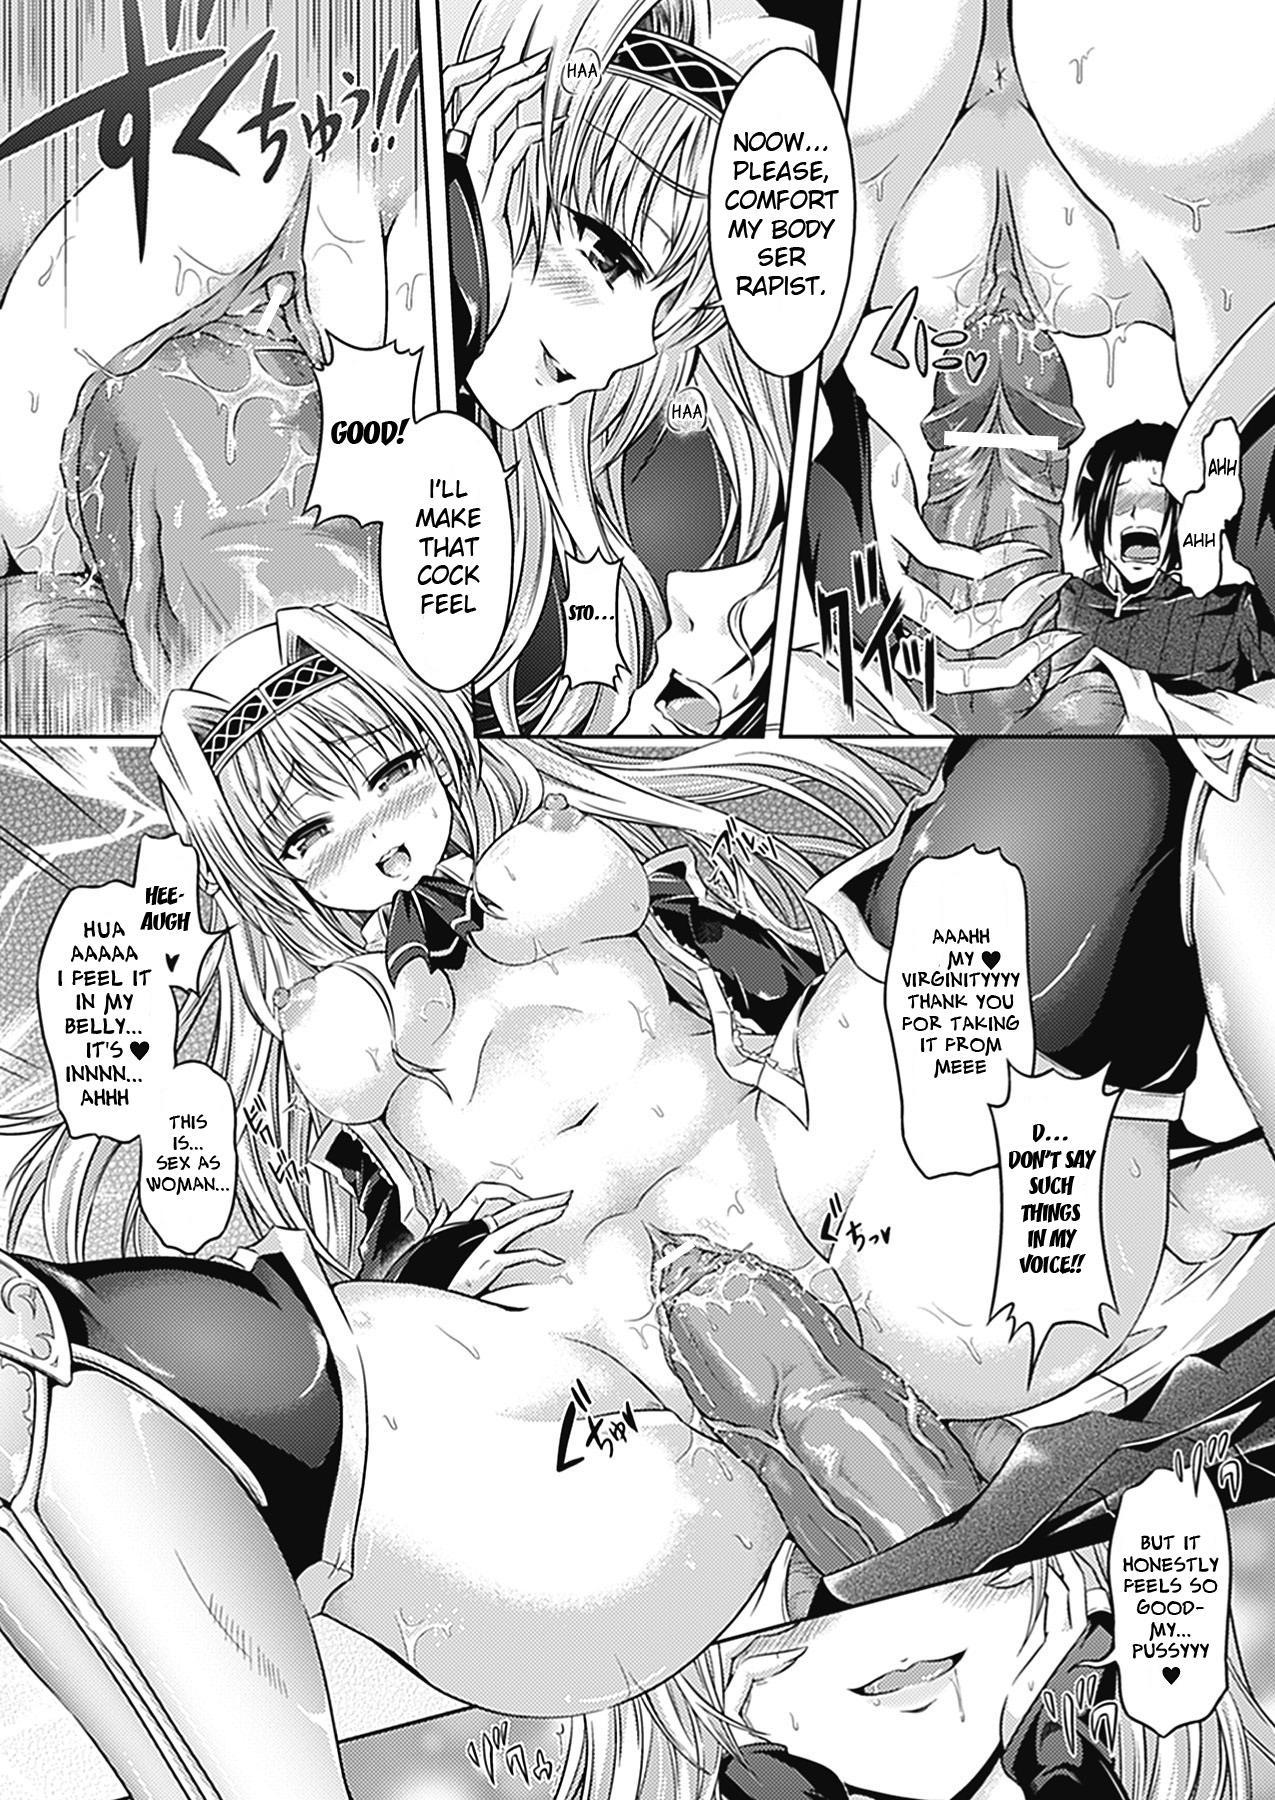 [Taniguchi-san] Girl Play - Trans-Sexual Fiction the Girls Play - ⚤TSF Catalog (English) {doujin-moe.us} 136